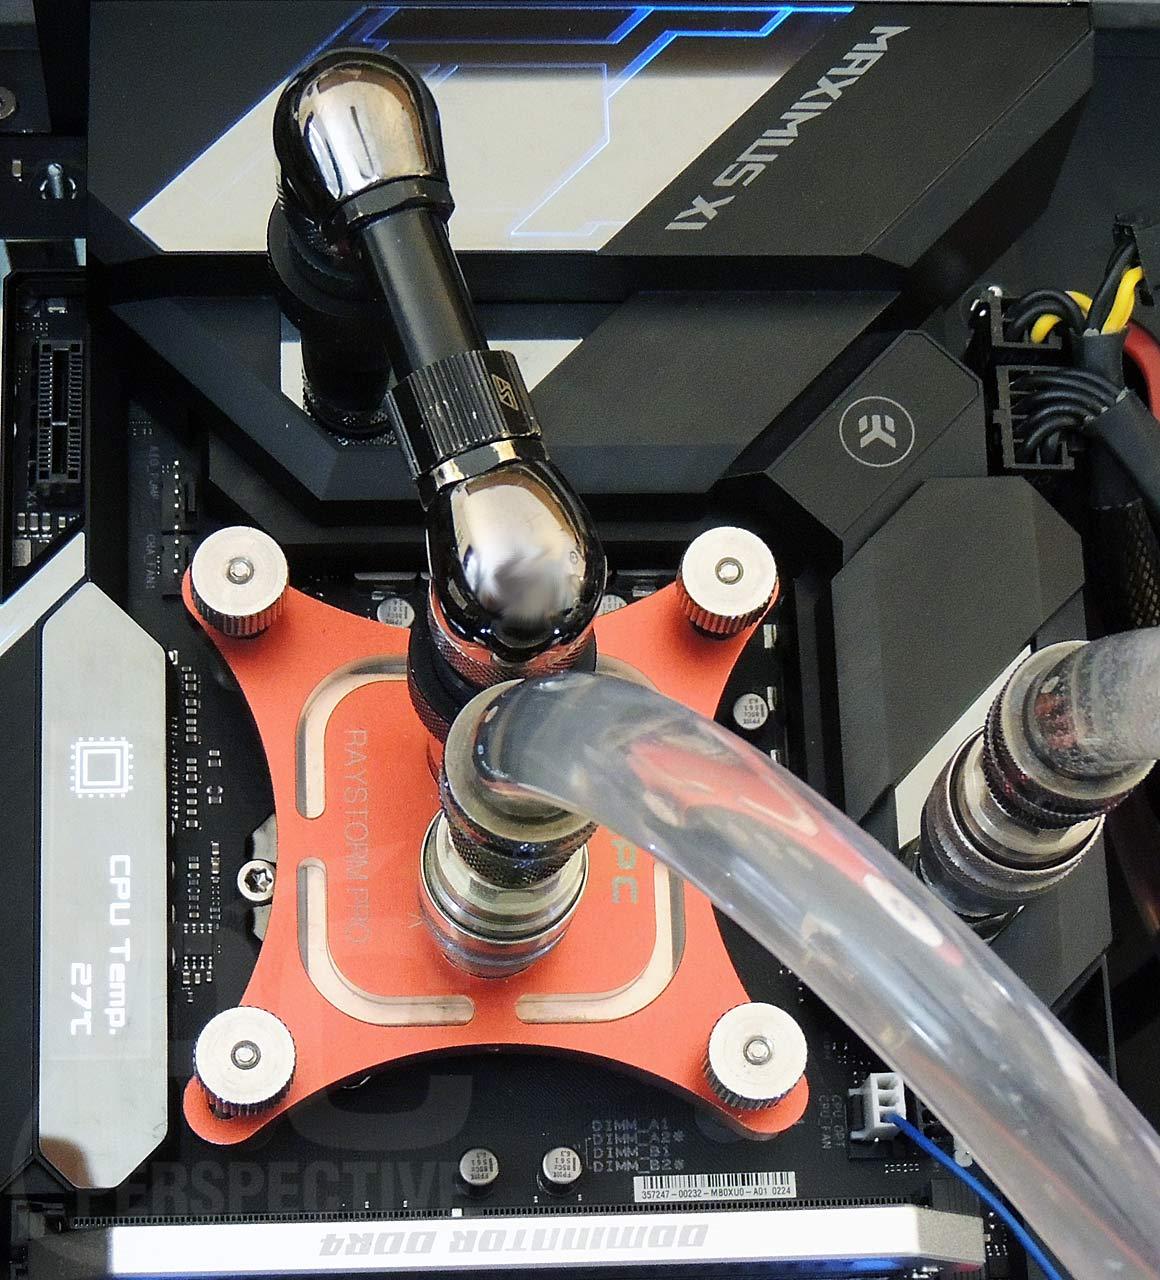 04-cpu-vrm-liquid-cooled-closeup.jpg